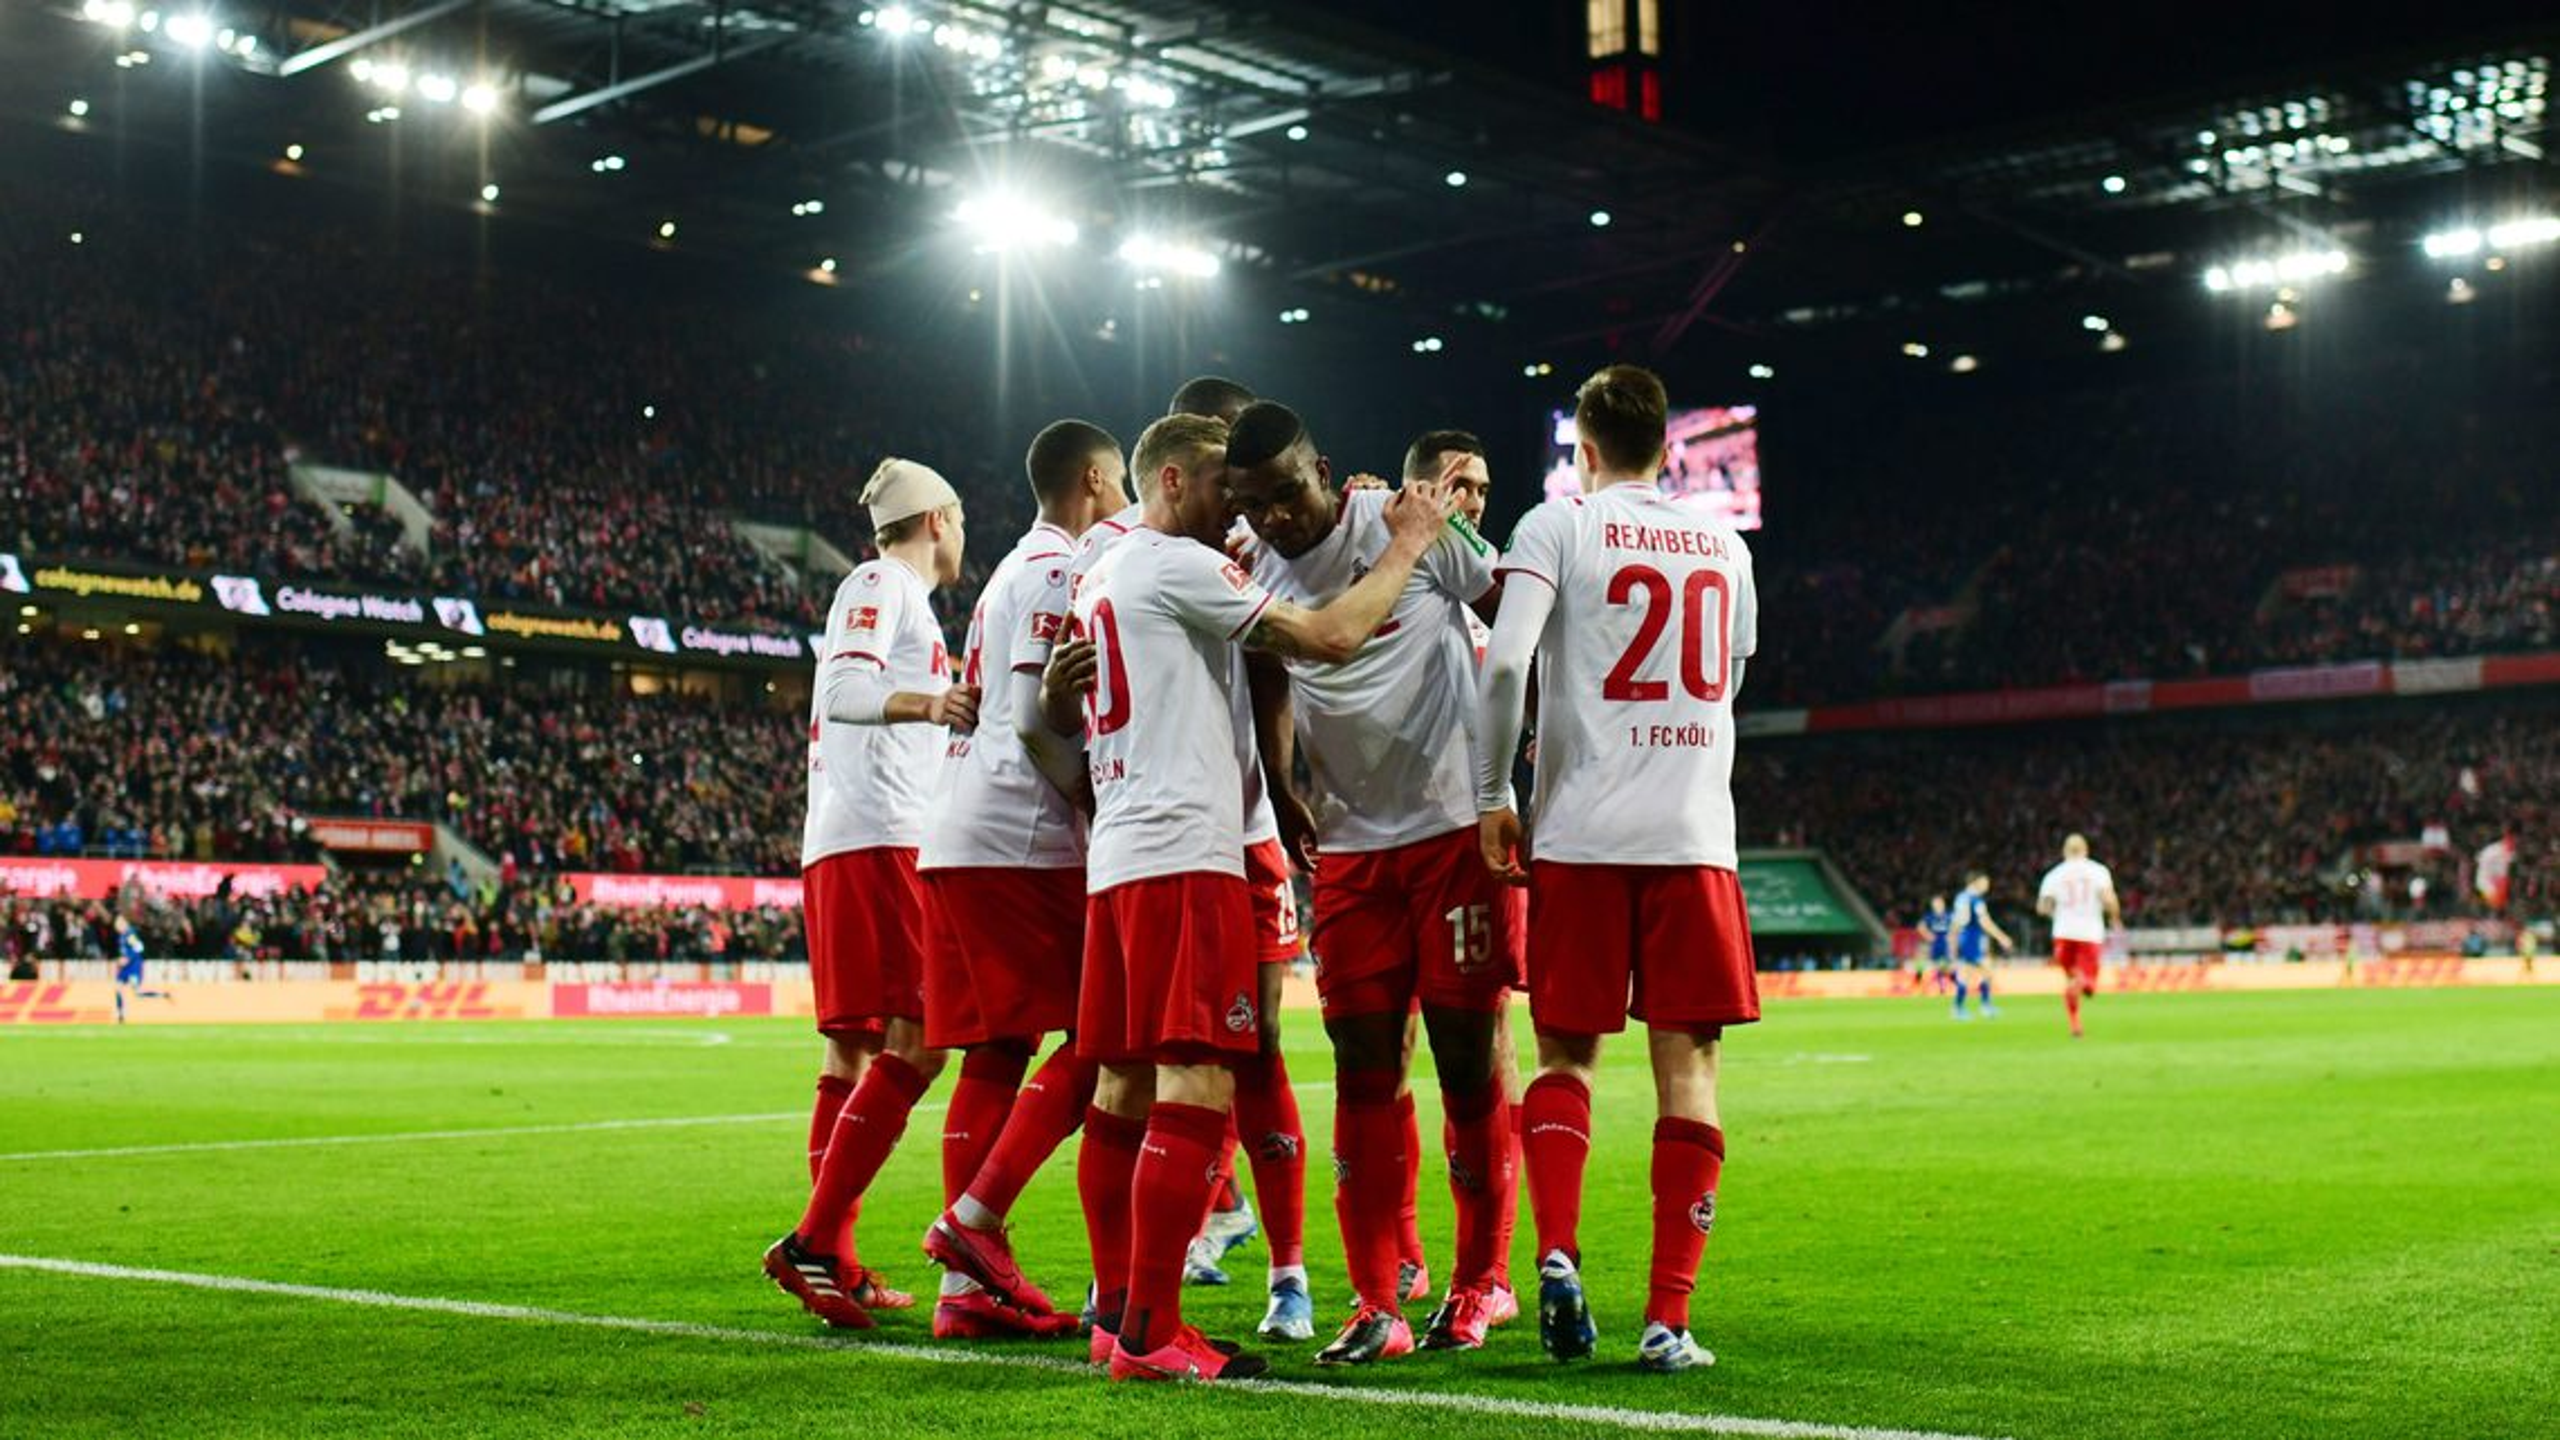 Köln Schalke Tickets